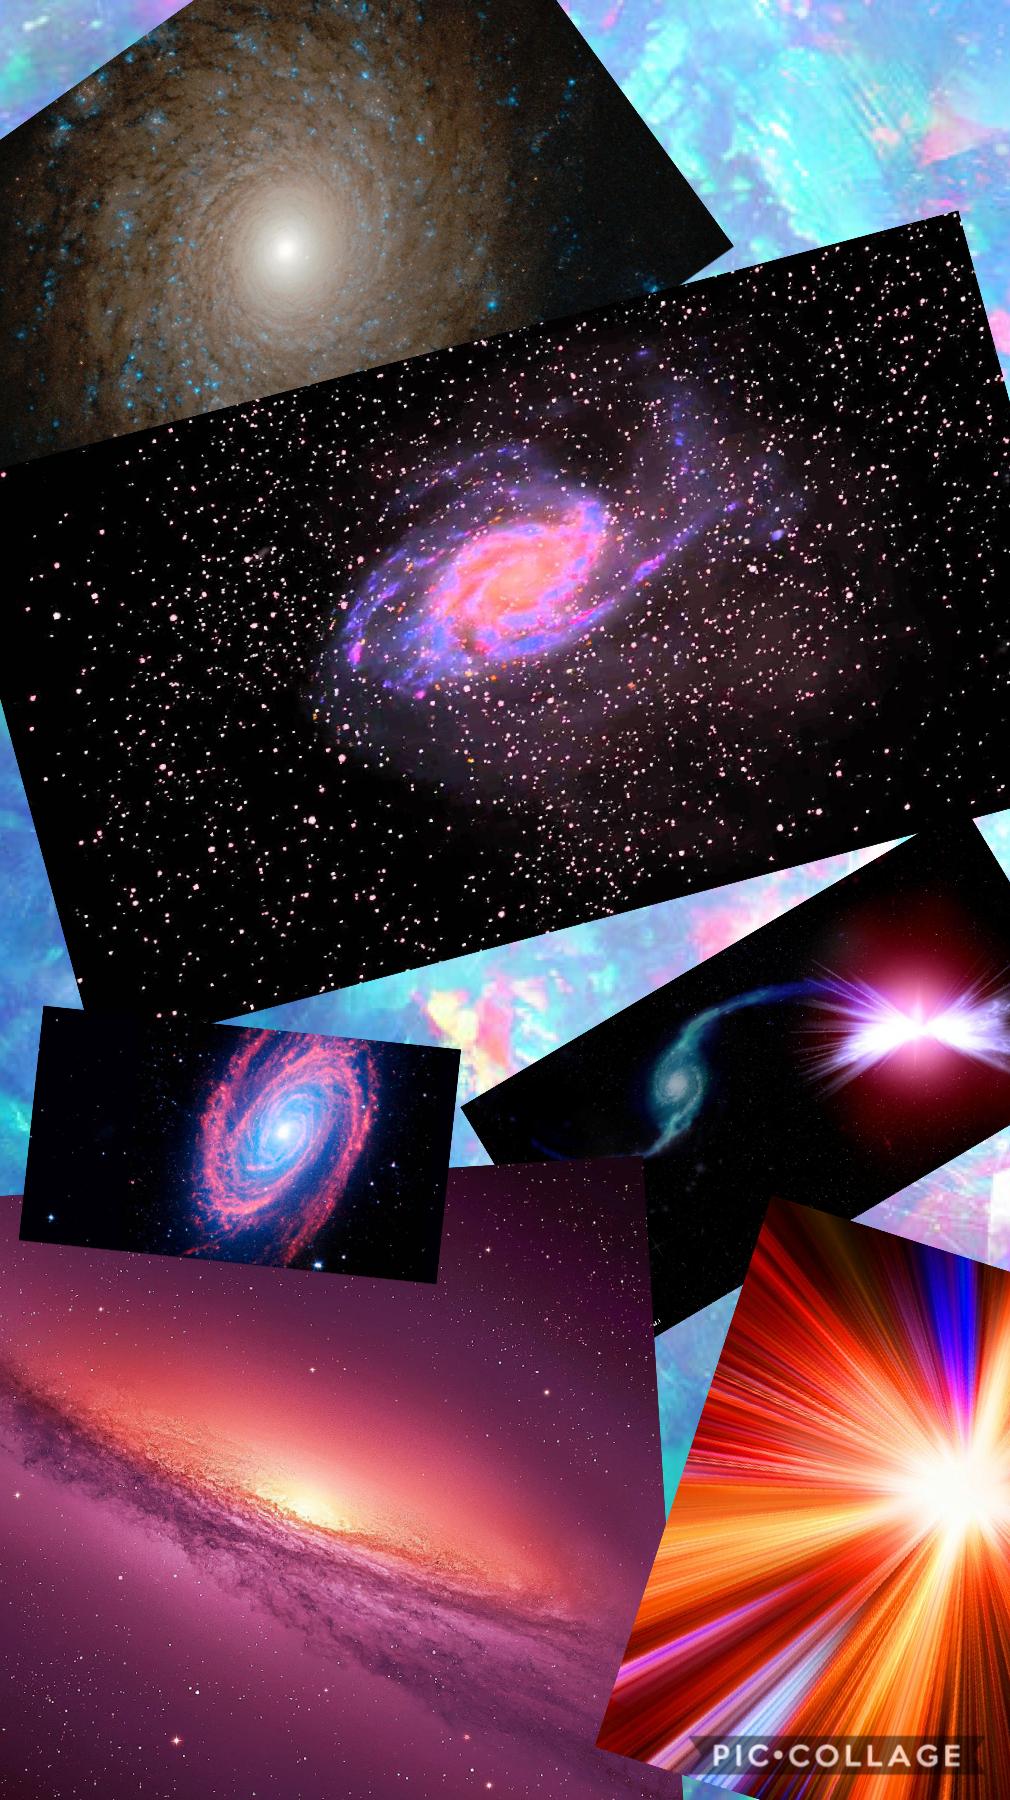 Galaxy please like I'm new I just started